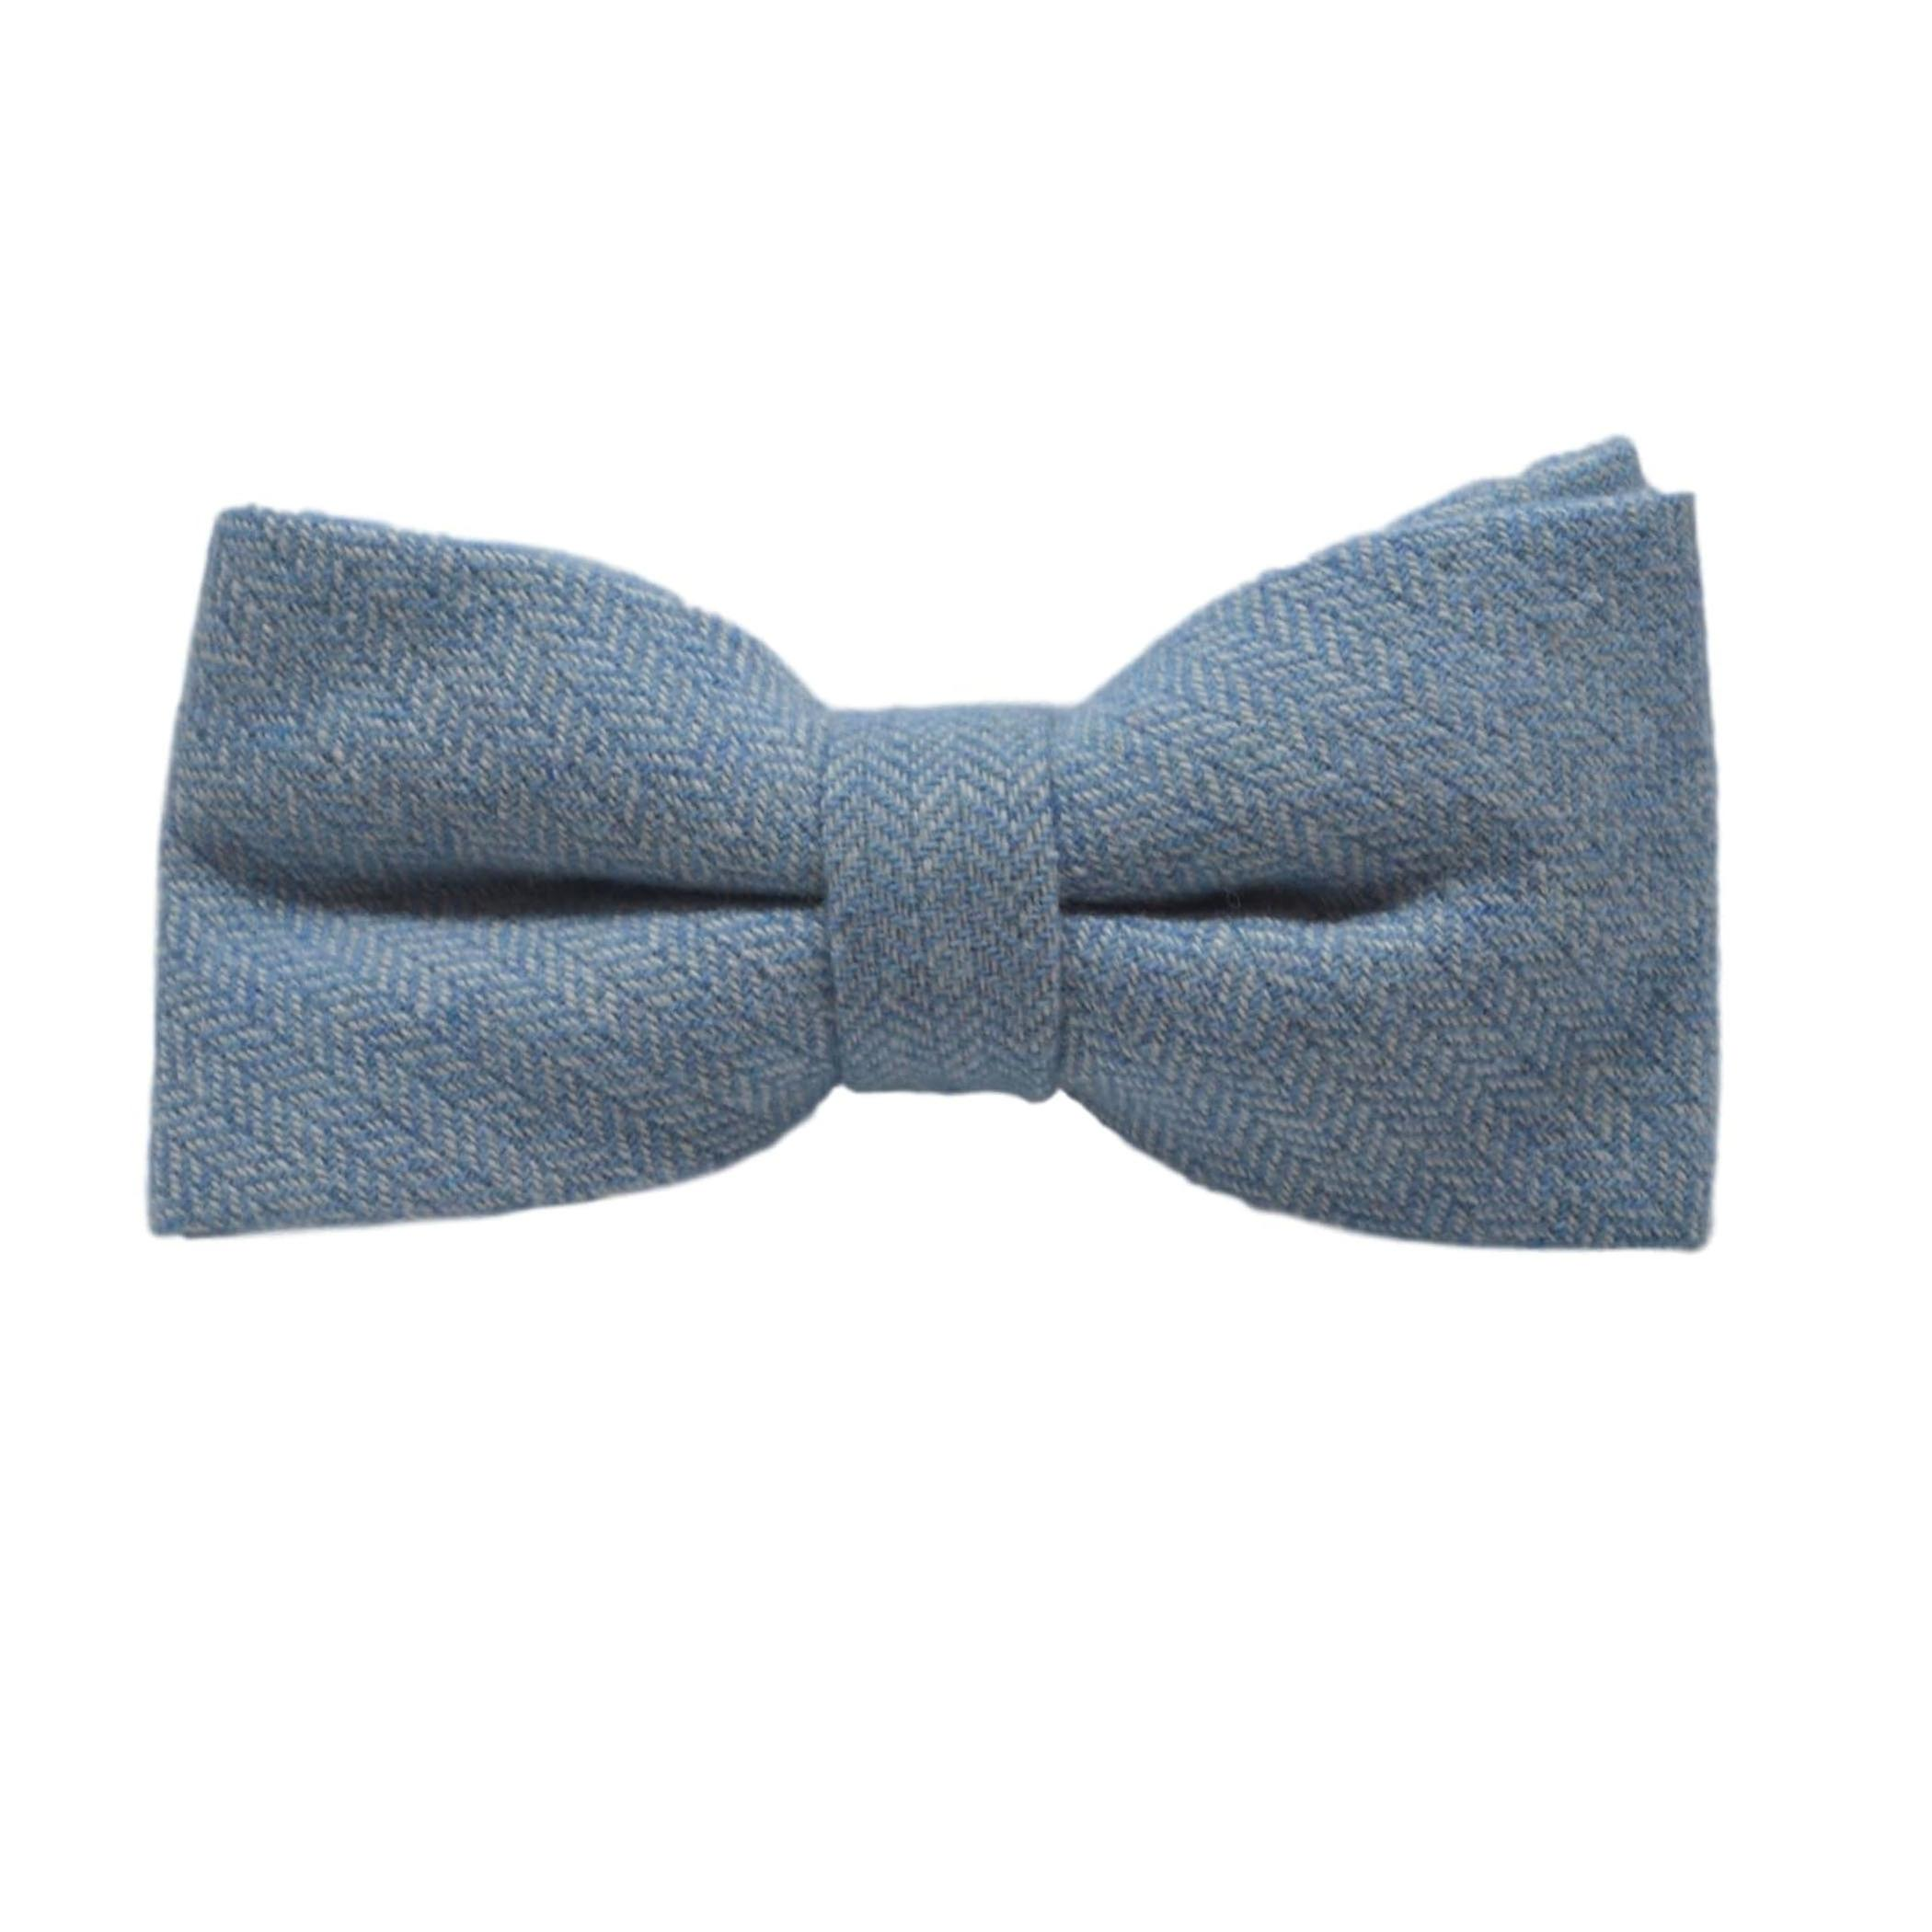 Sky Blue Herringbone Bow Tie & Pocket Square Set